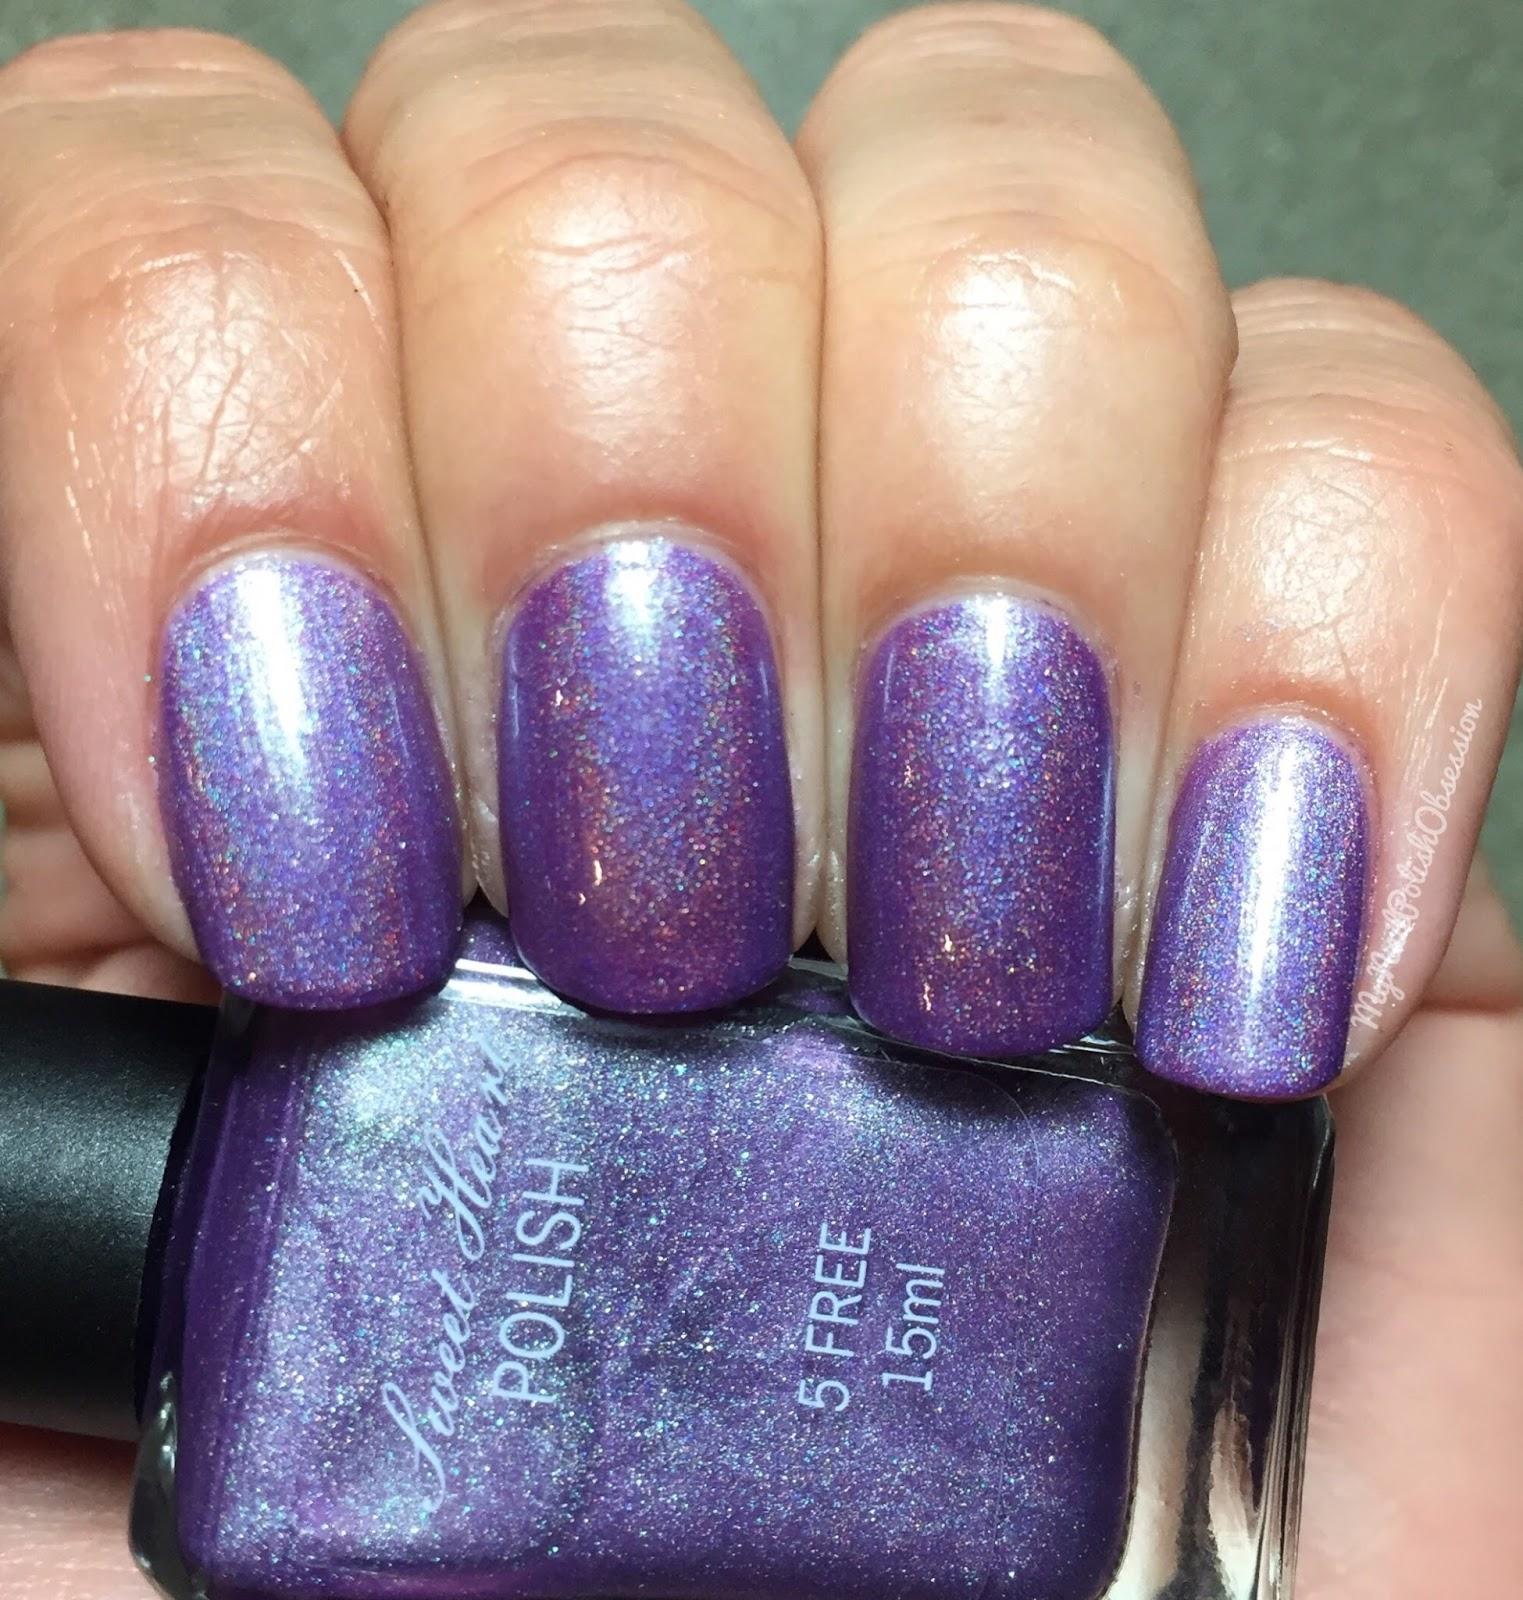 Rapunzel Nails: My Nail Polish Obsession: Sweet Heart Polish Rapunzel Trio